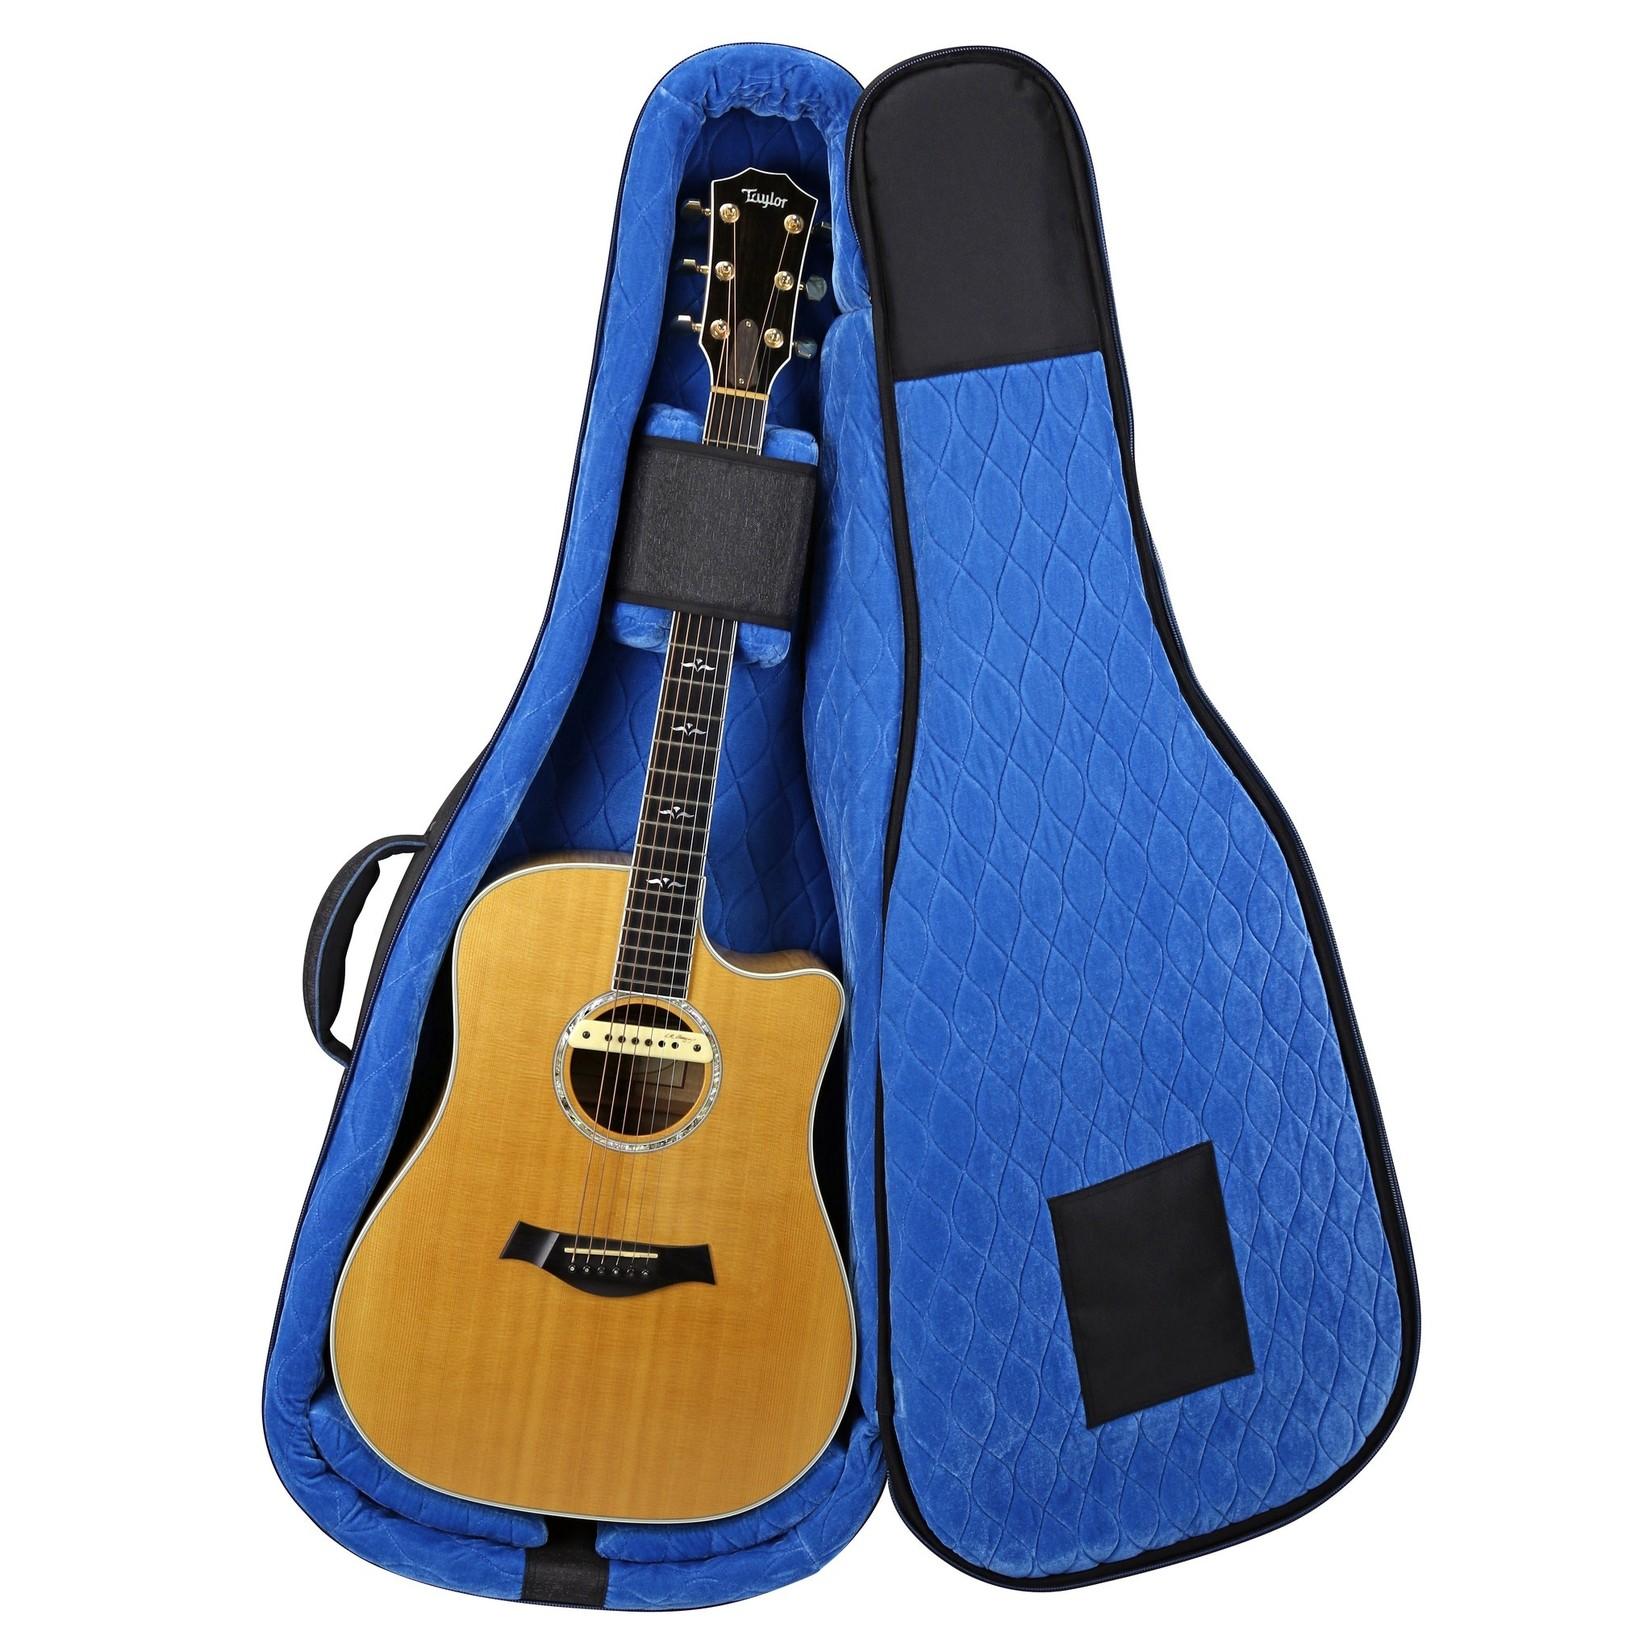 Reunion Blues Reunion Blues RB Continental Voyager Dreadnought Acoustic Guitar Case (RBCA2)